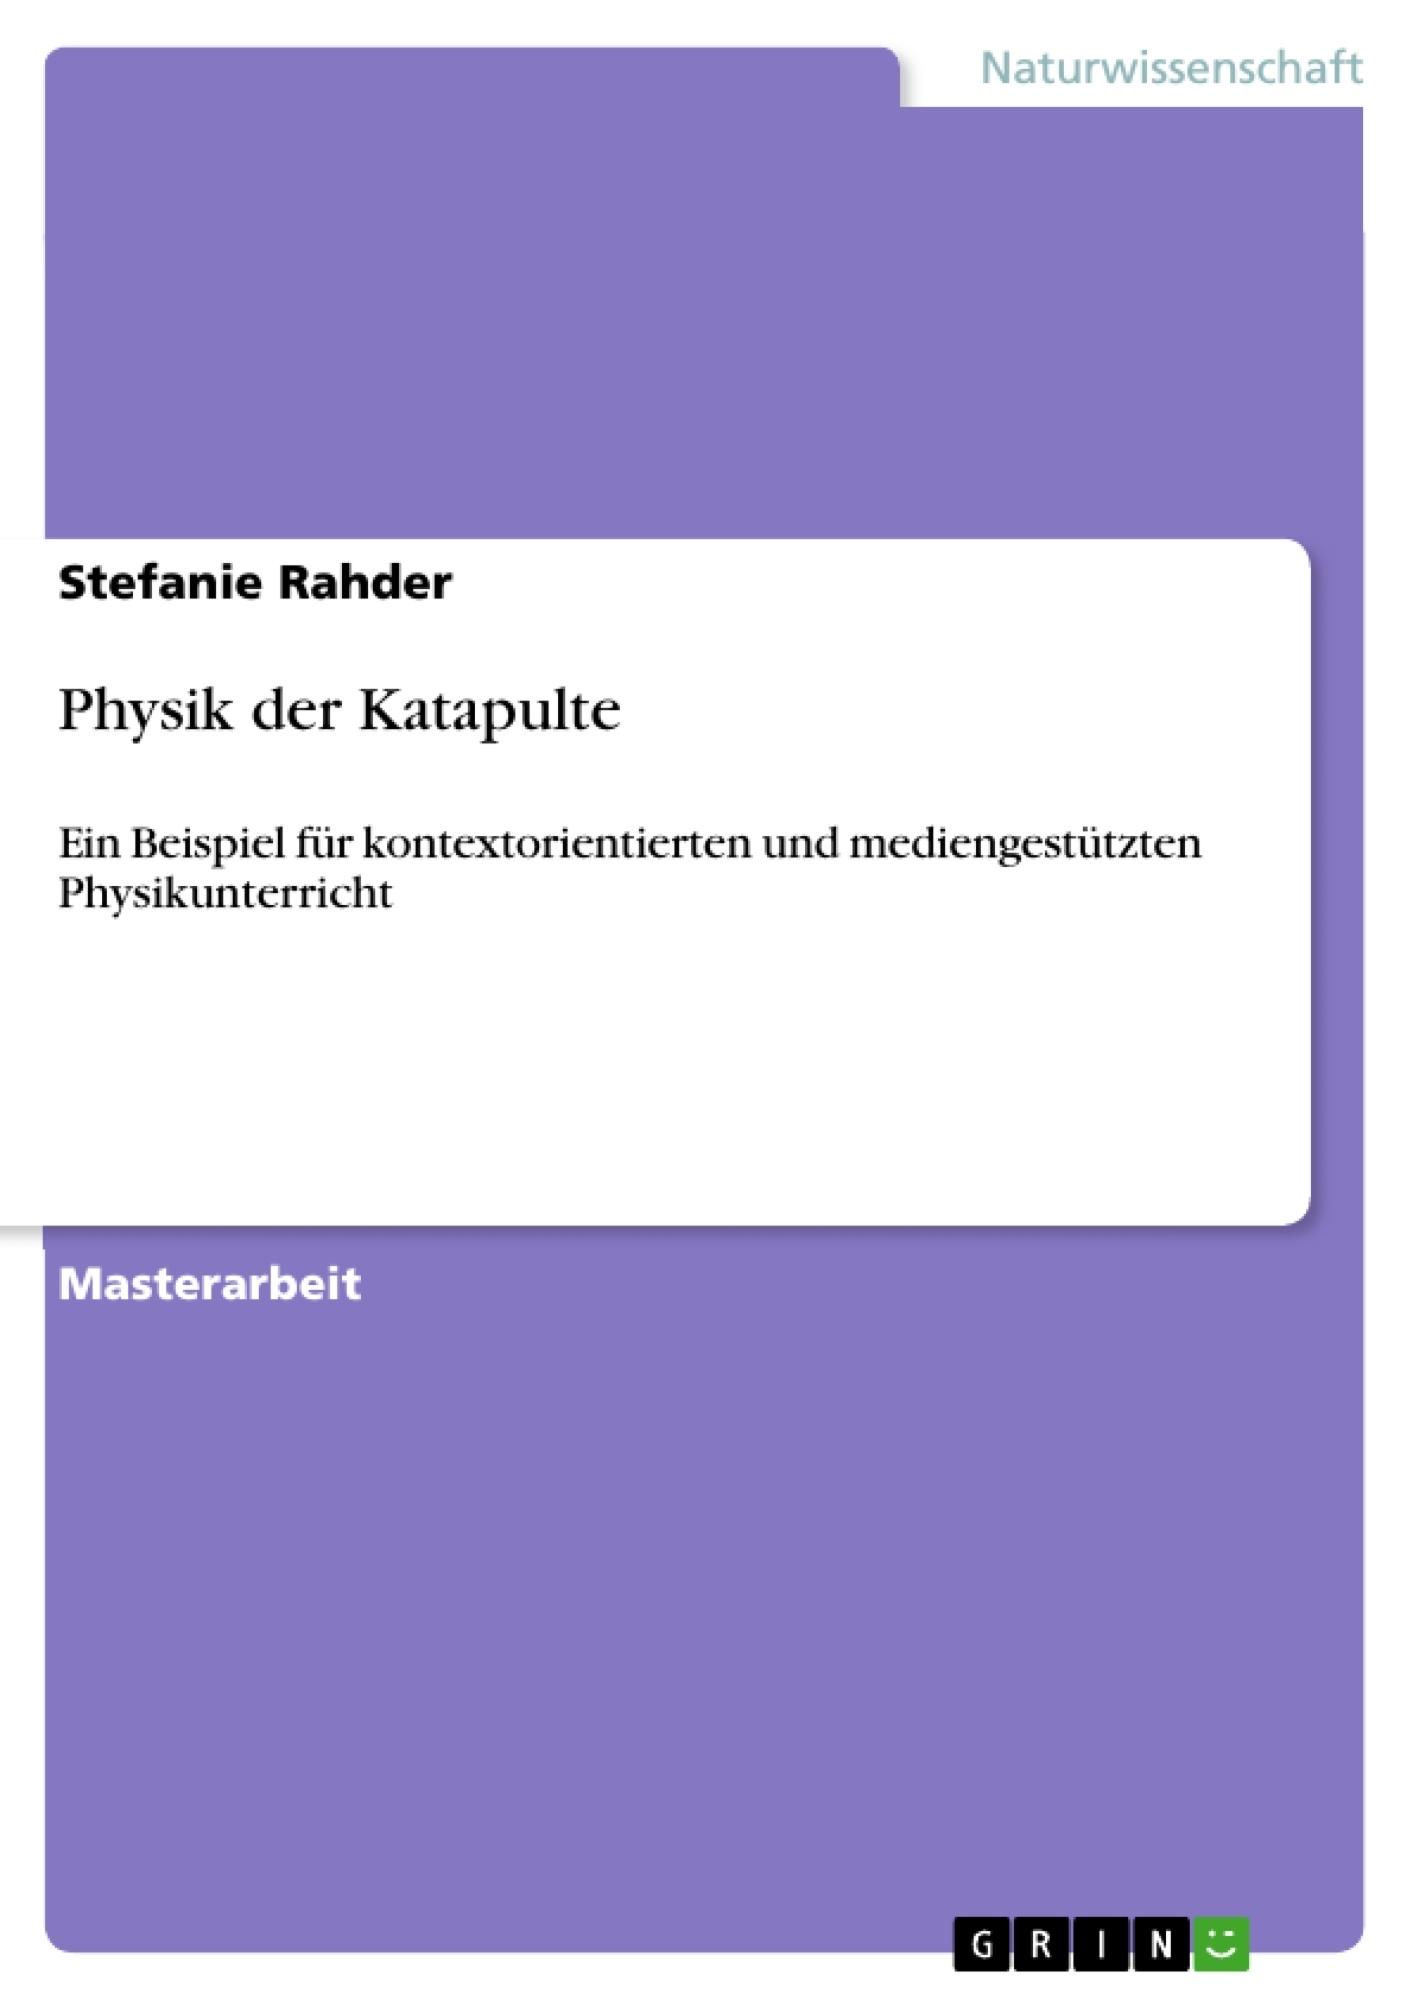 Physik der Katapulte | Masterarbeit, Hausarbeit, Bachelorarbeit ...